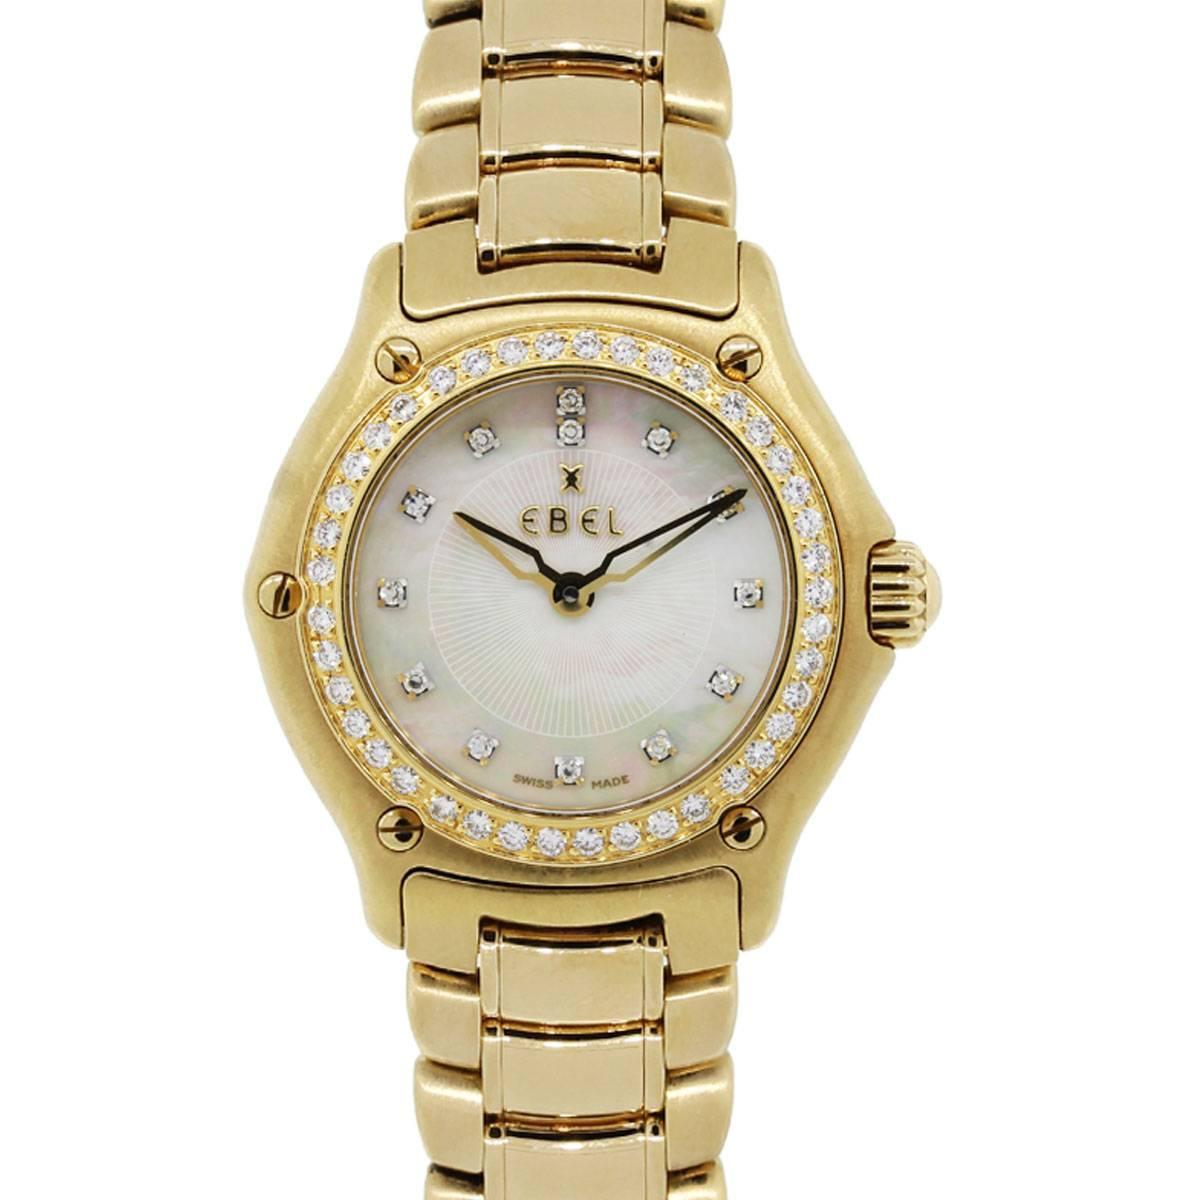 Ebel Ladies yellow gold Mother of pearl diamond dial 1911 Quartz Wristwatch